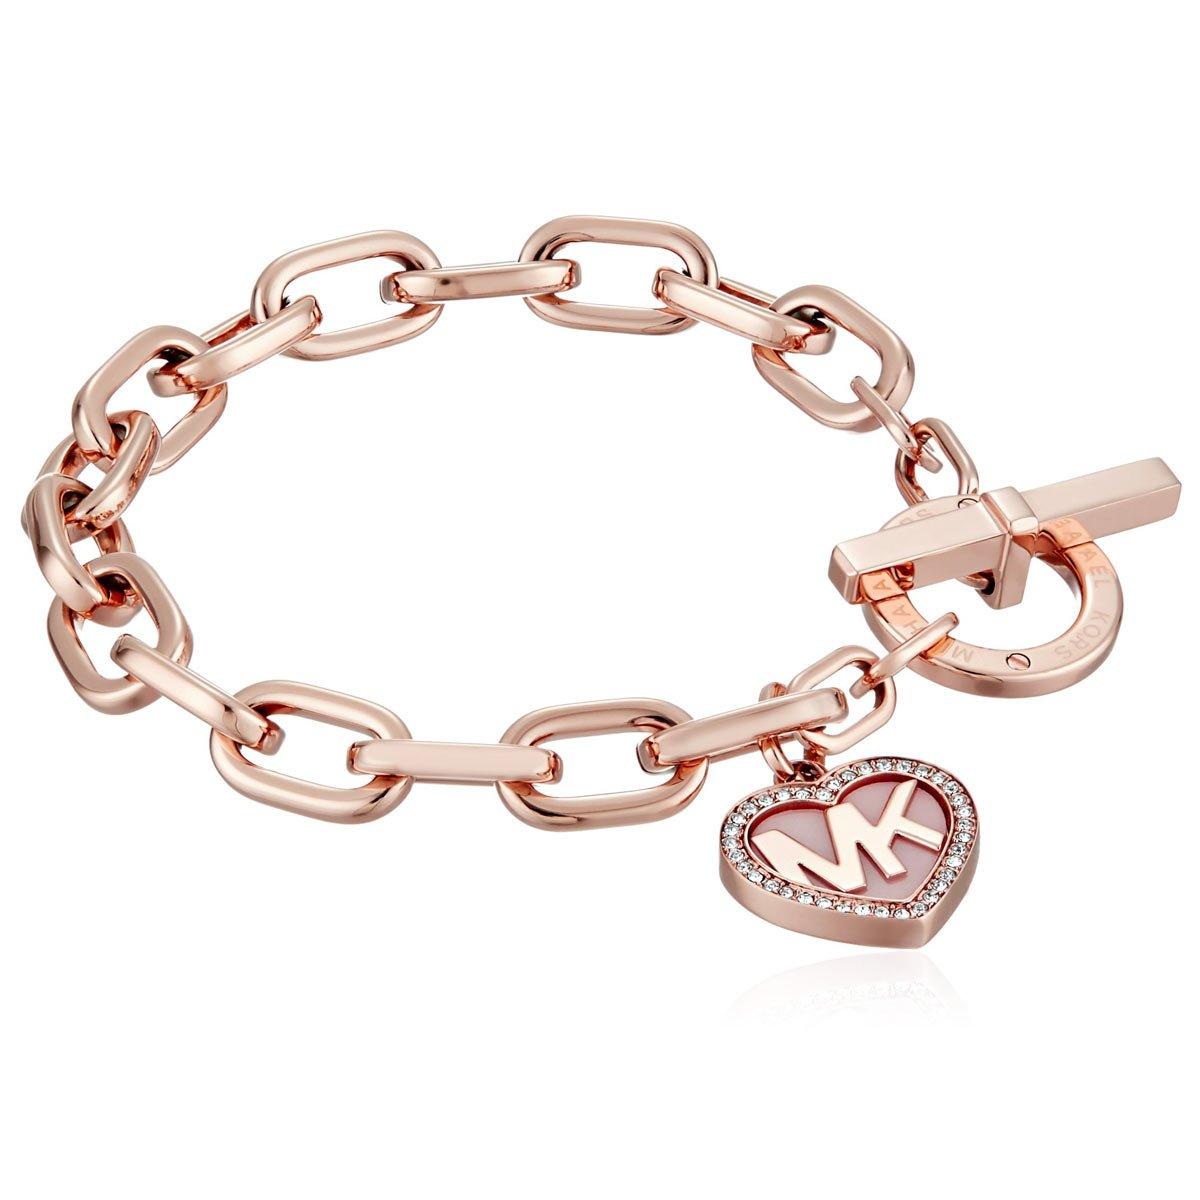 Michael Kors Rose Goldtone Blush Acetate Valentine's Day Toggle Closure Bracelet